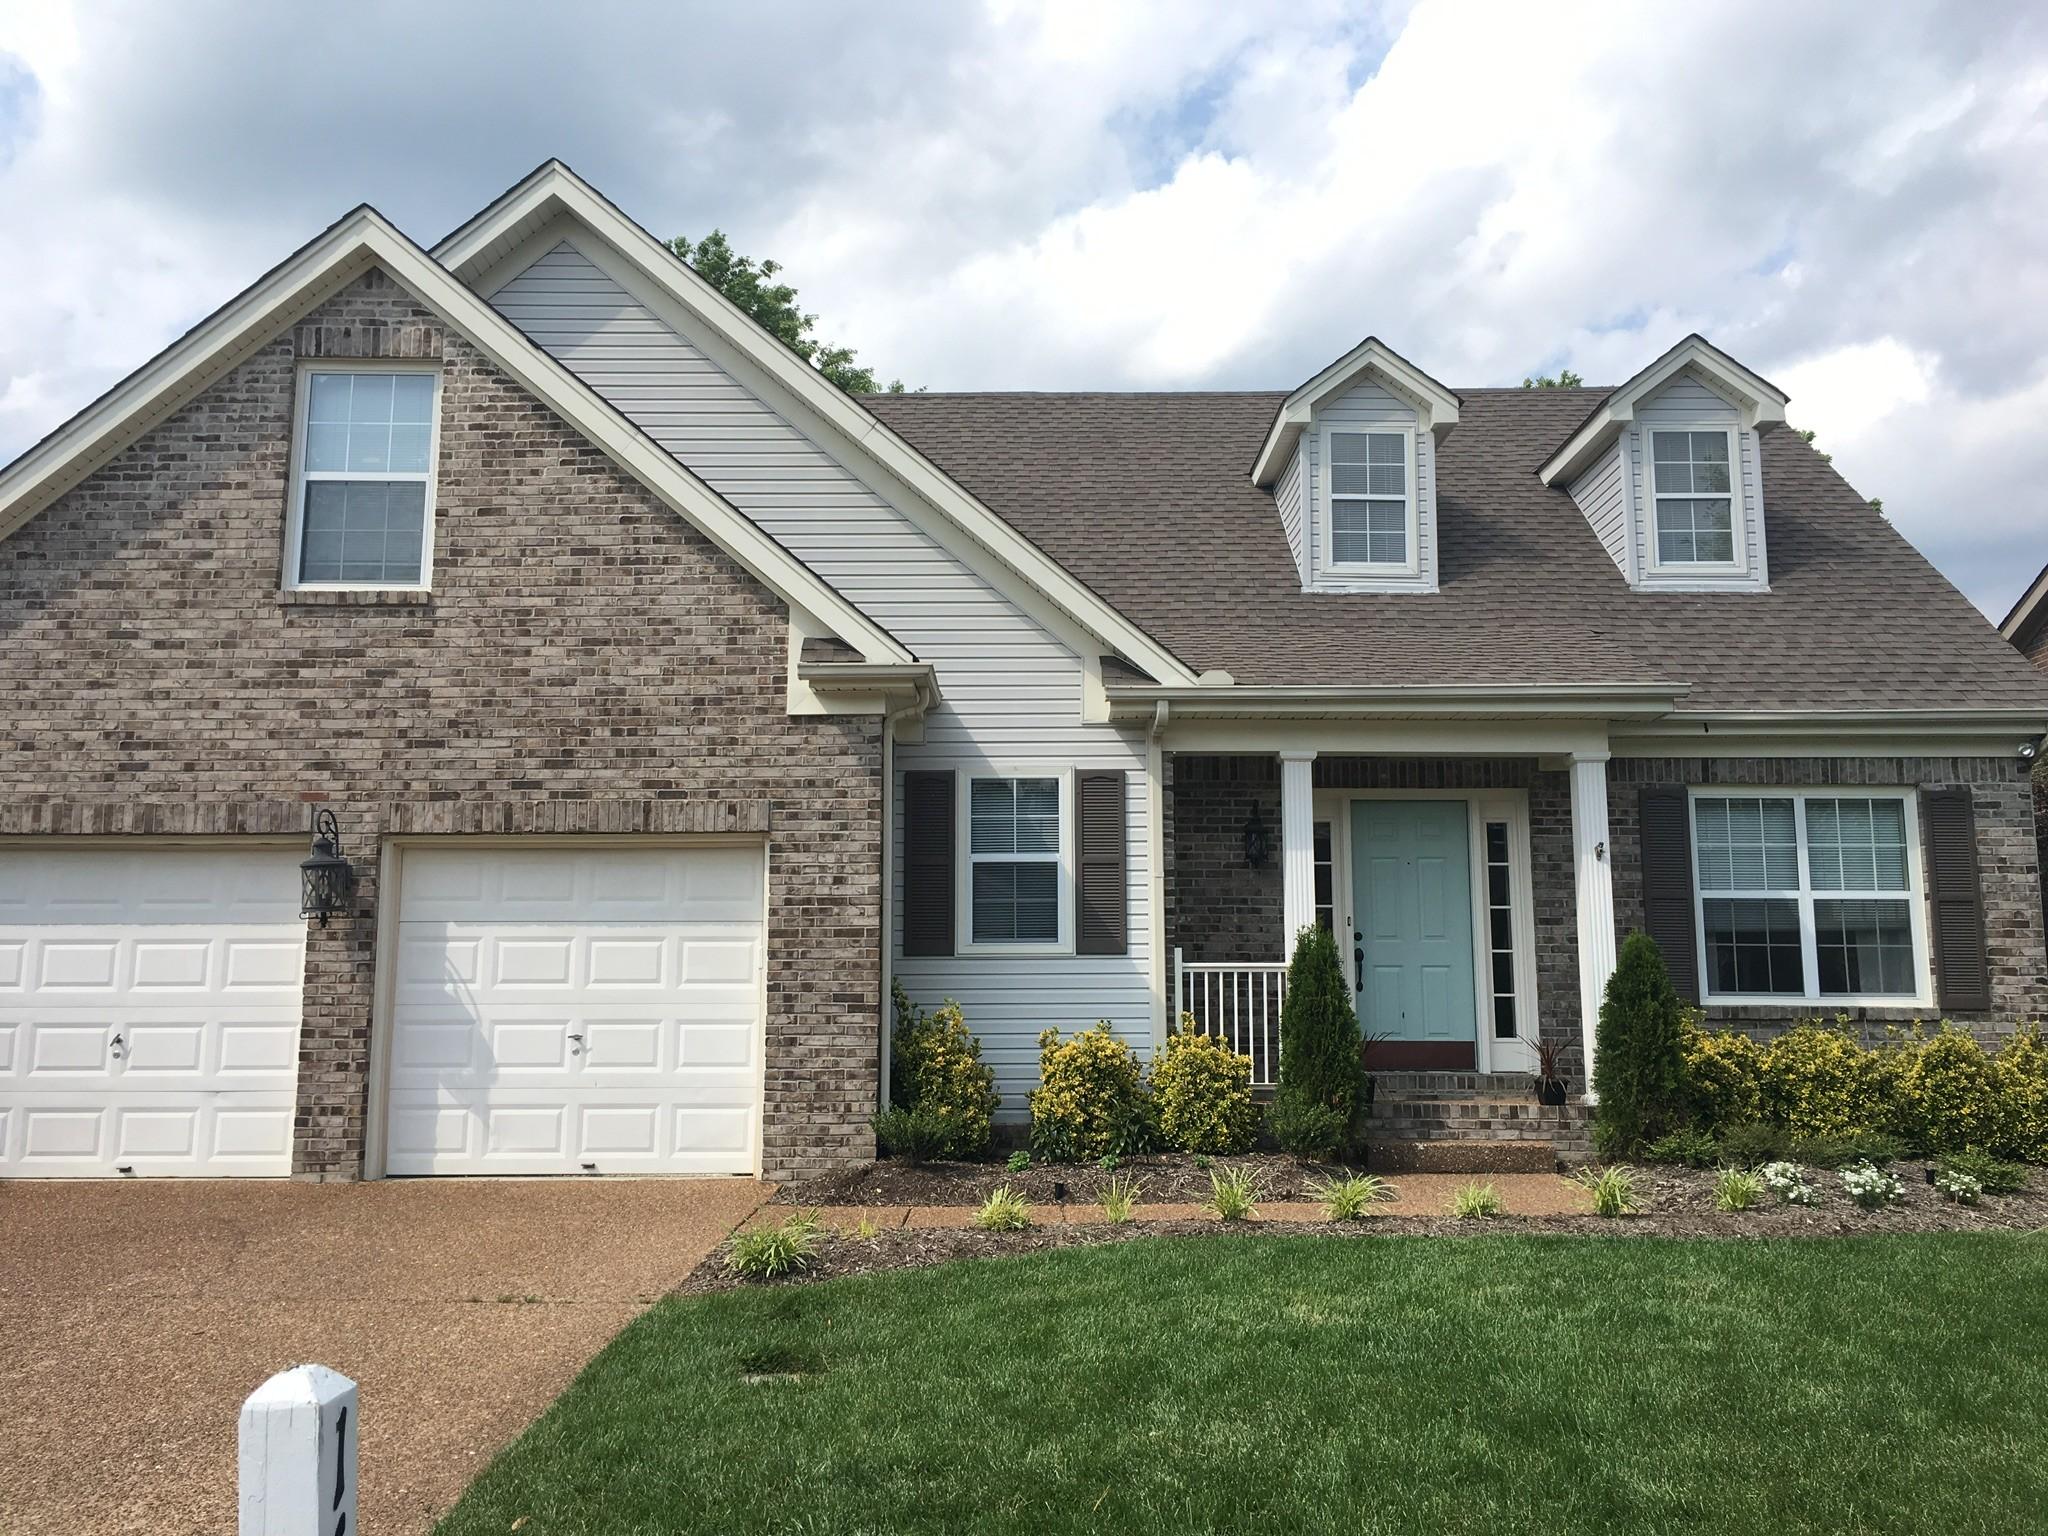 161 Crestfield Pl Property Photo - Franklin, TN real estate listing